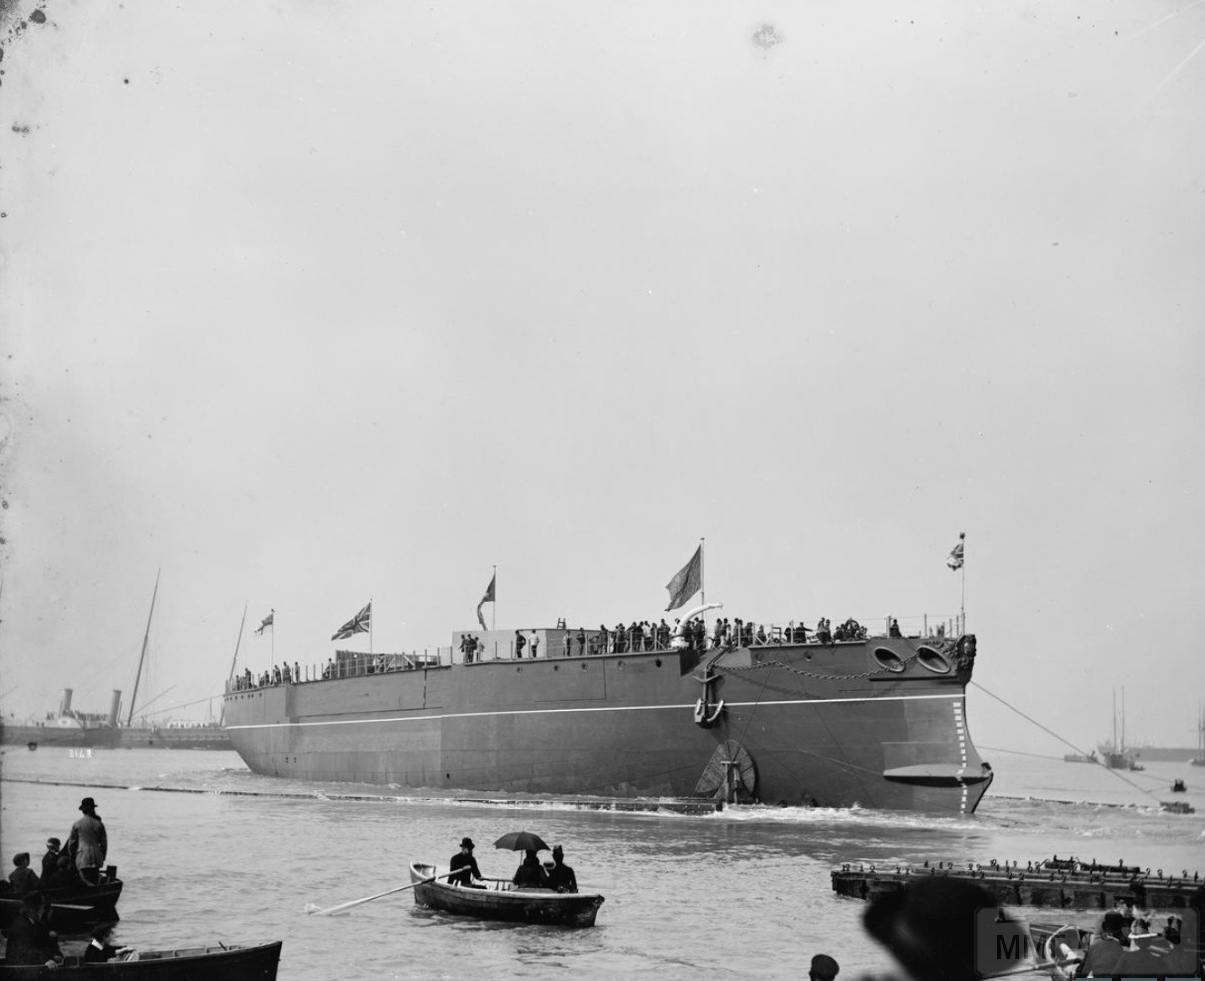 56555 - HMS Trafalgar